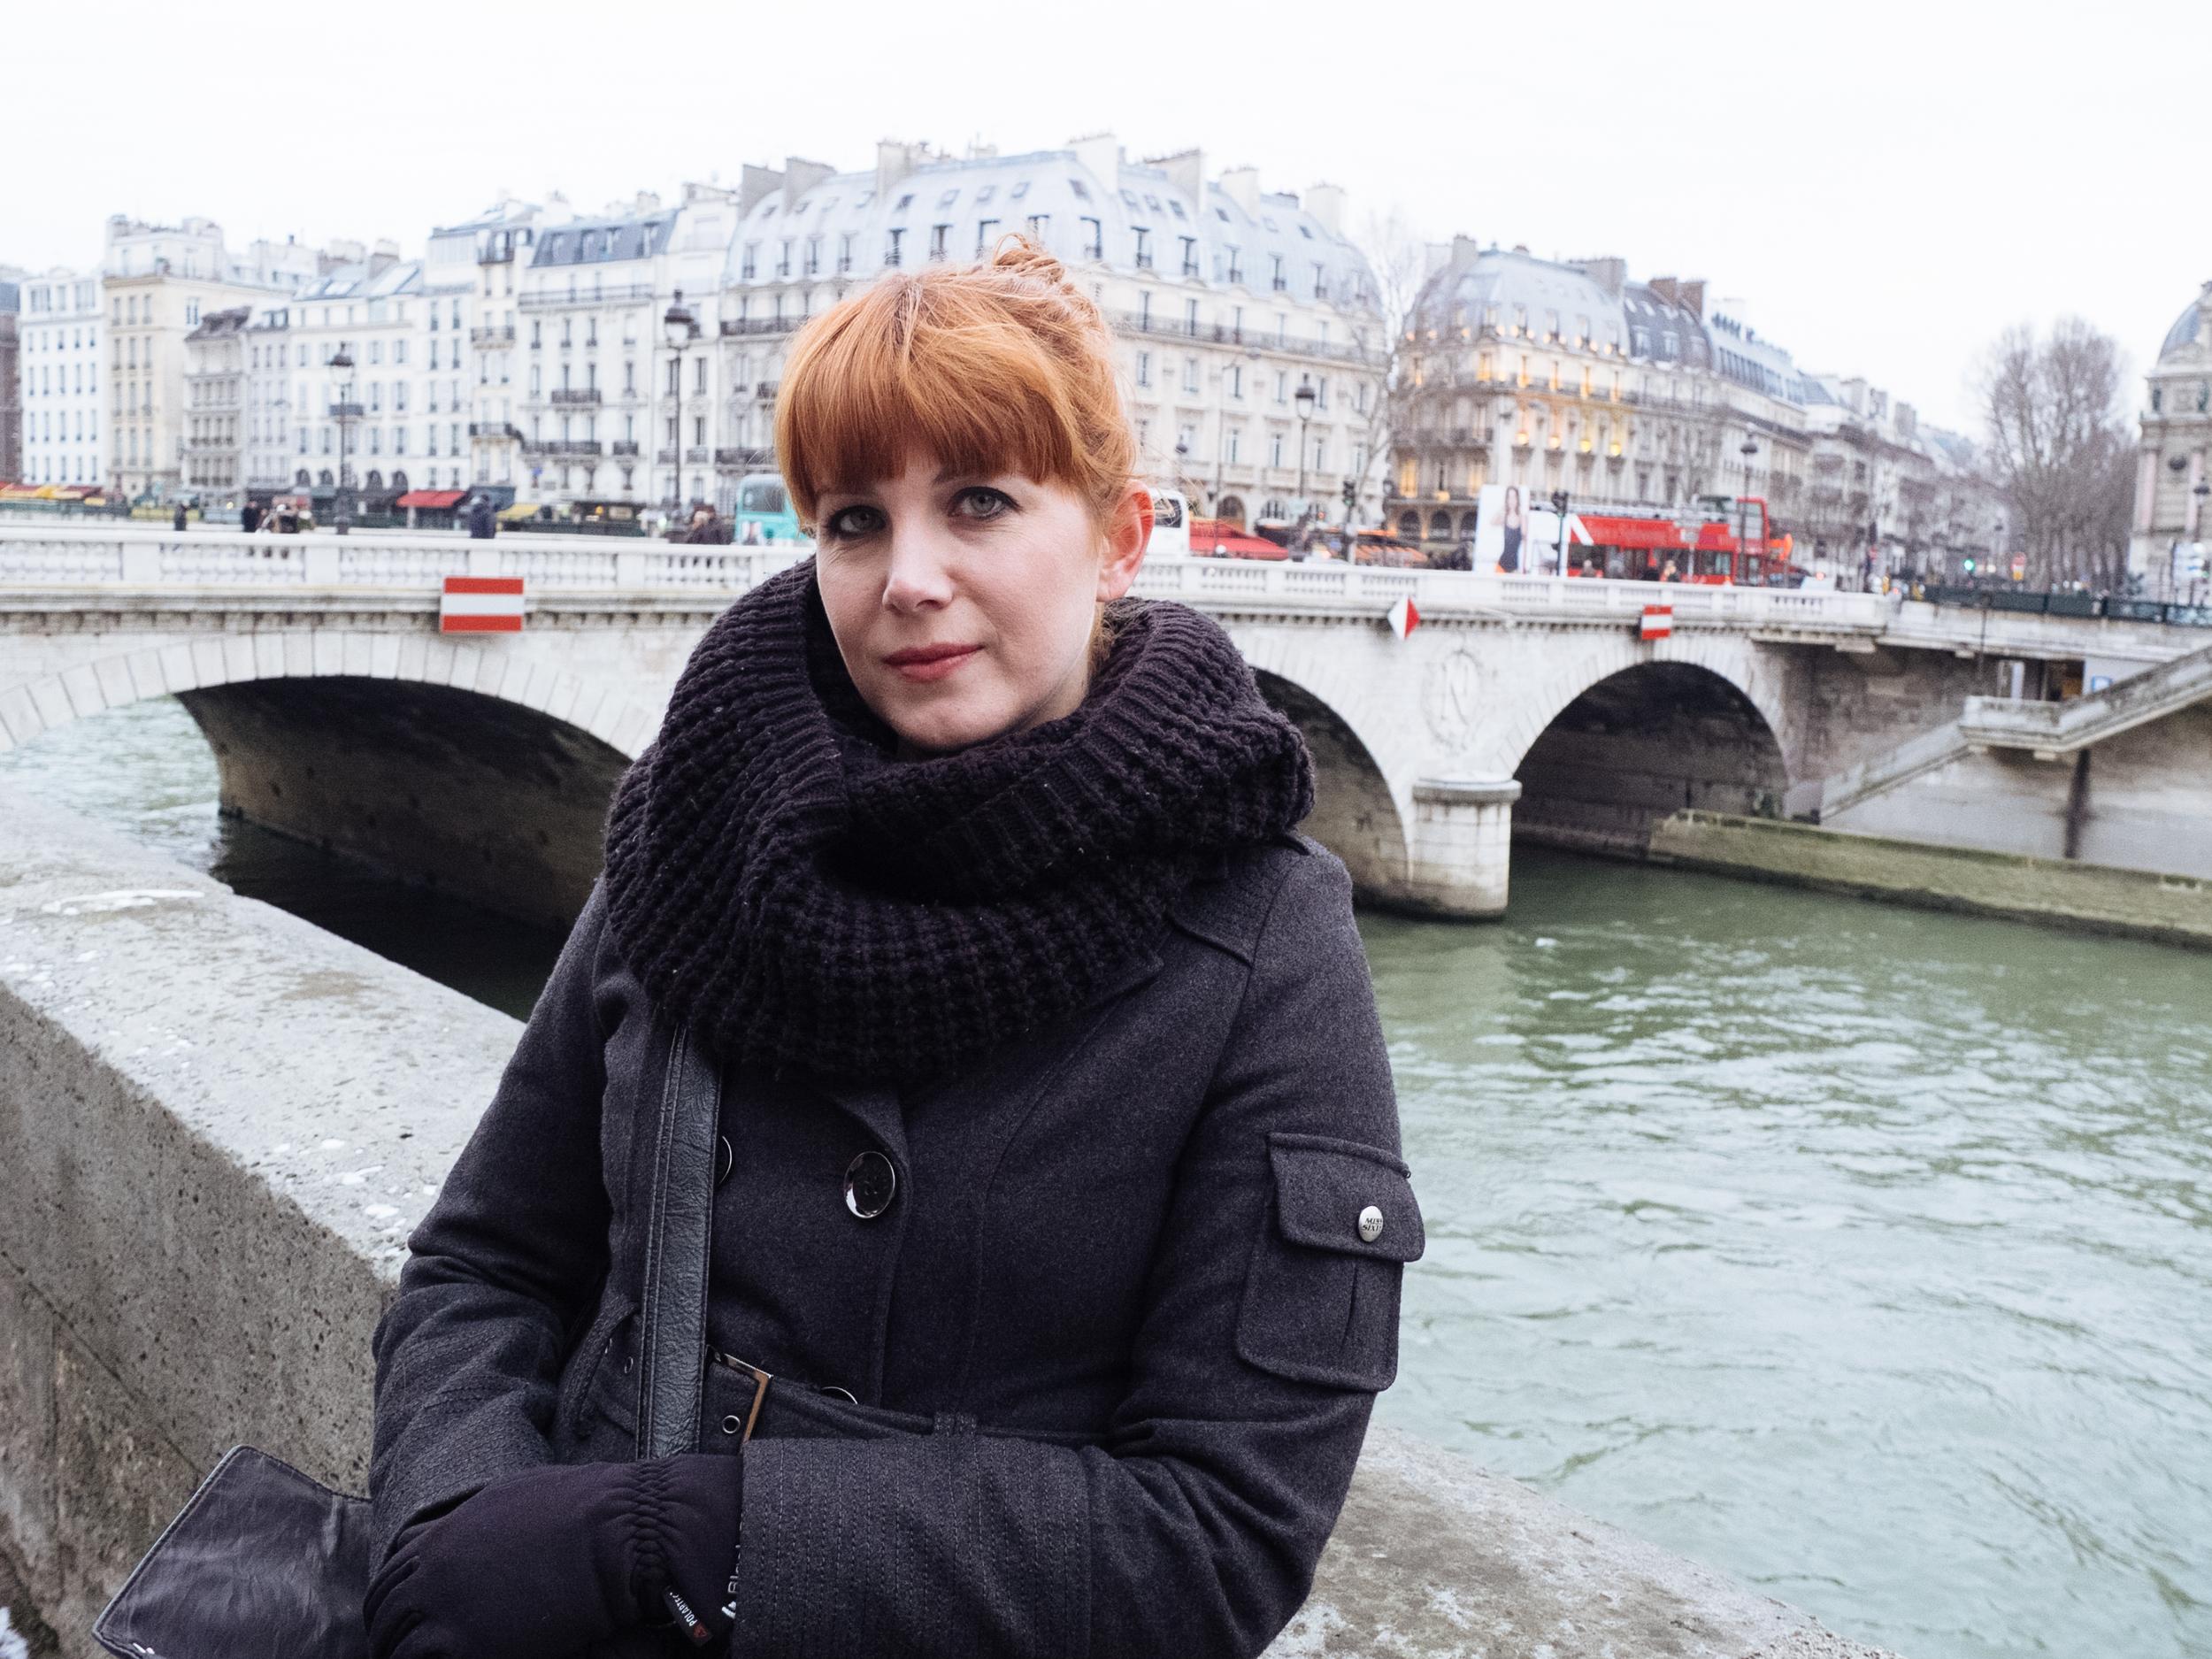 paris-0073.jpg